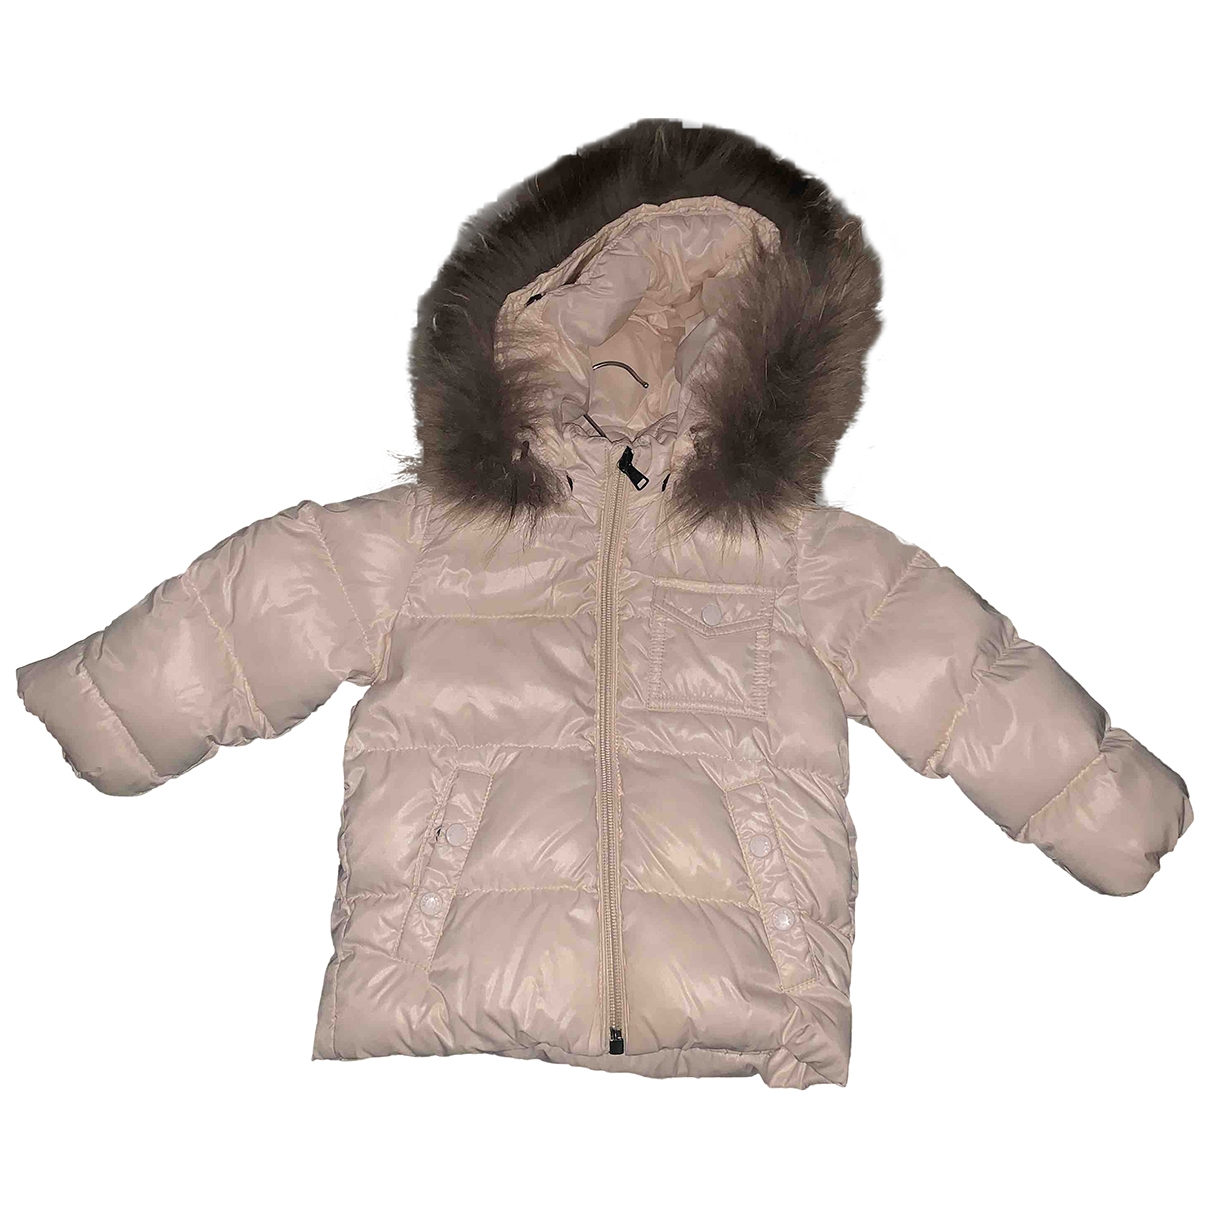 Moncler Fur Hood Pink jacket & coat for Kids 2 years - up to 86cm FR